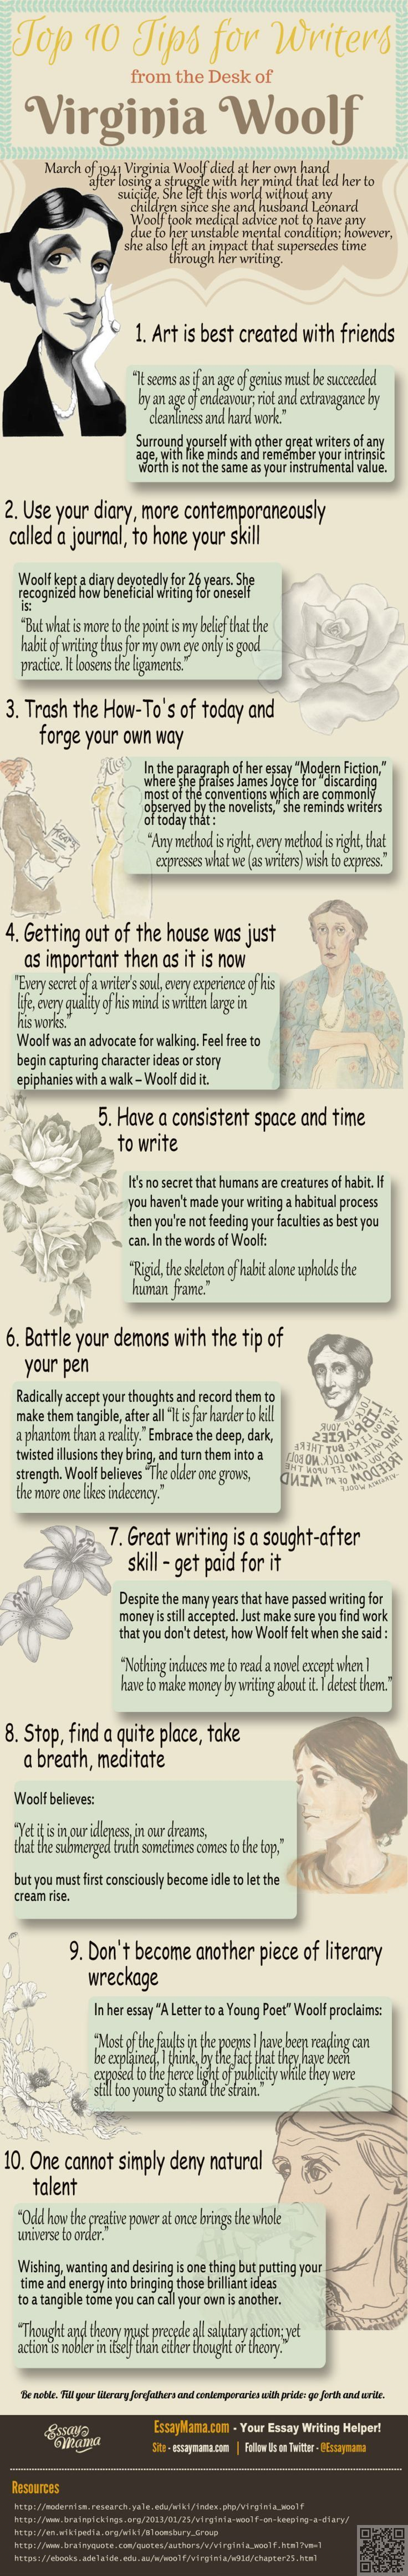 Writing Quotes Writing Inspiration Writing Tips Writing Ideas Writing Creative Writing Fiction Writing Nonfictio Writing Tips Writing Advice Writing Life